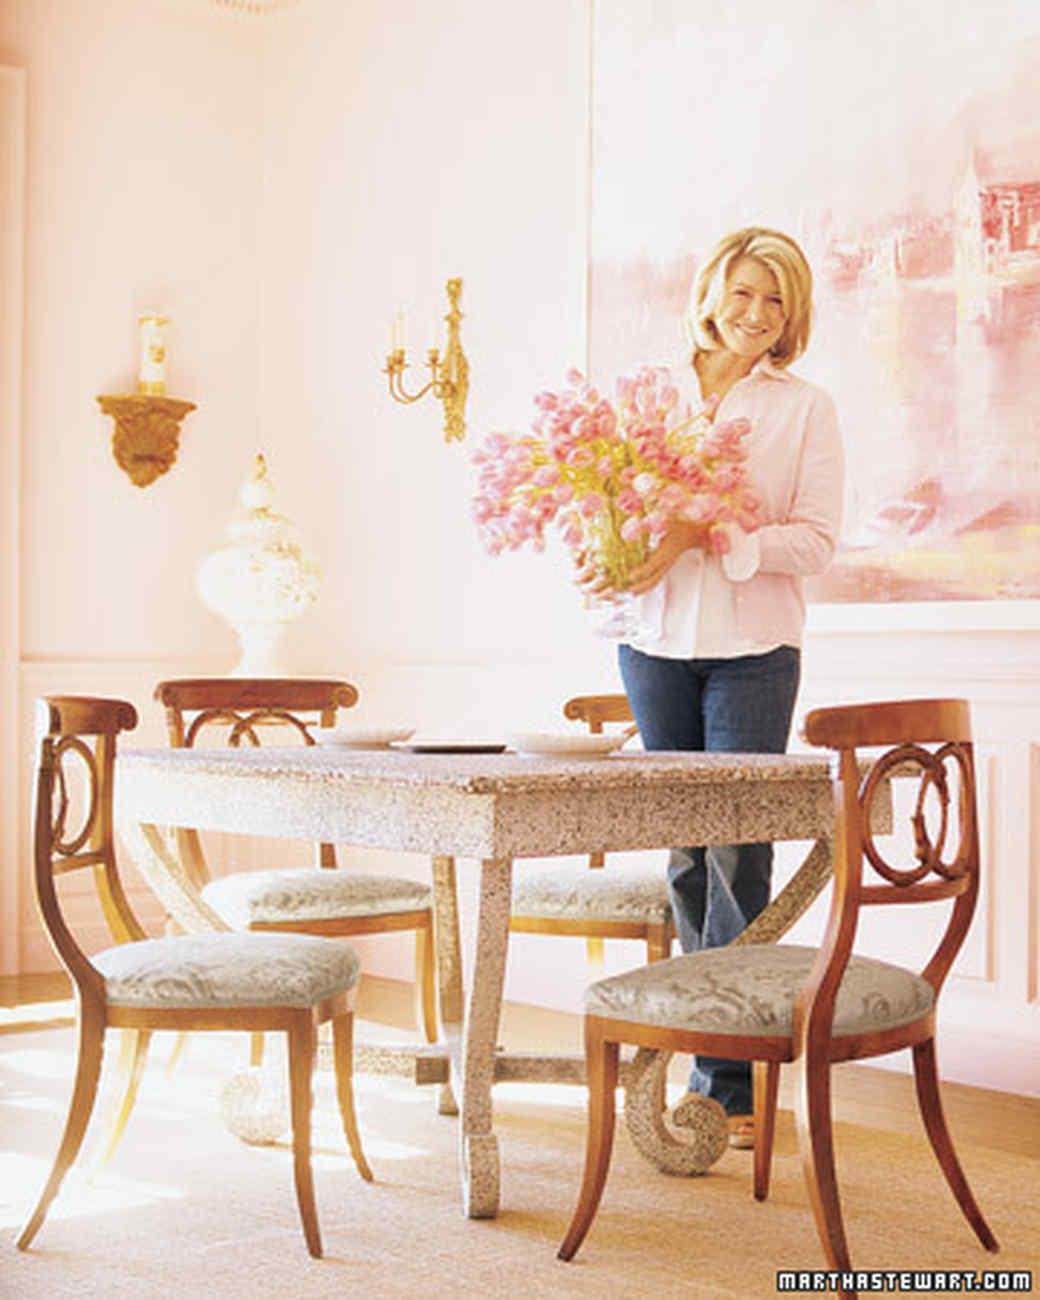 Martha Stewart Dining Room  Cteamus - Martha stewart dining room table